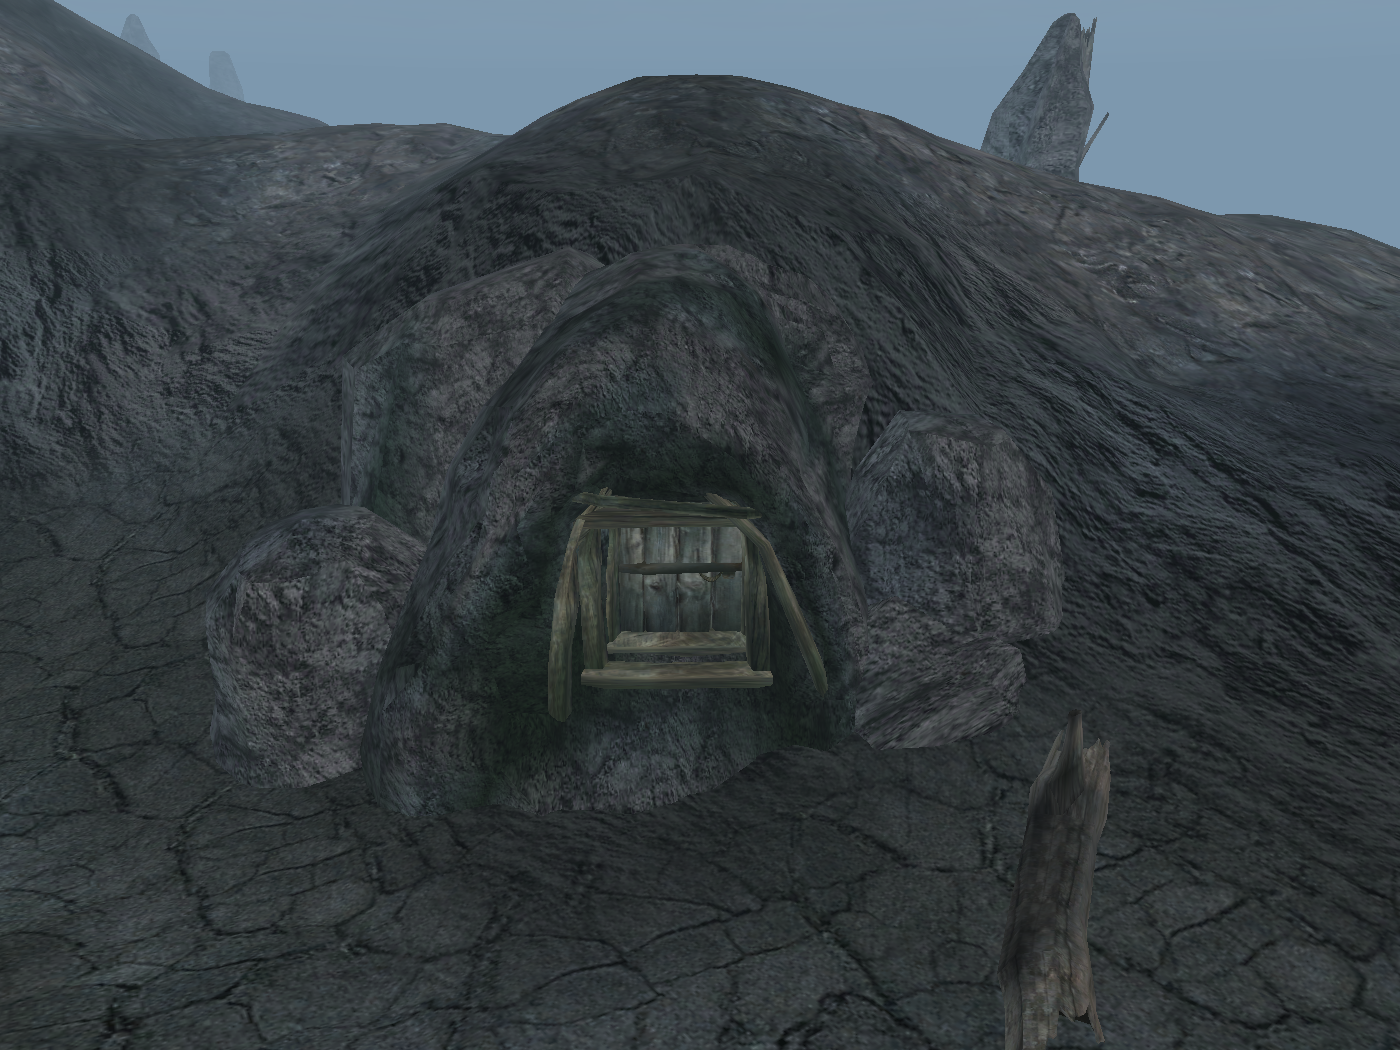 Punabi (Morrowind)